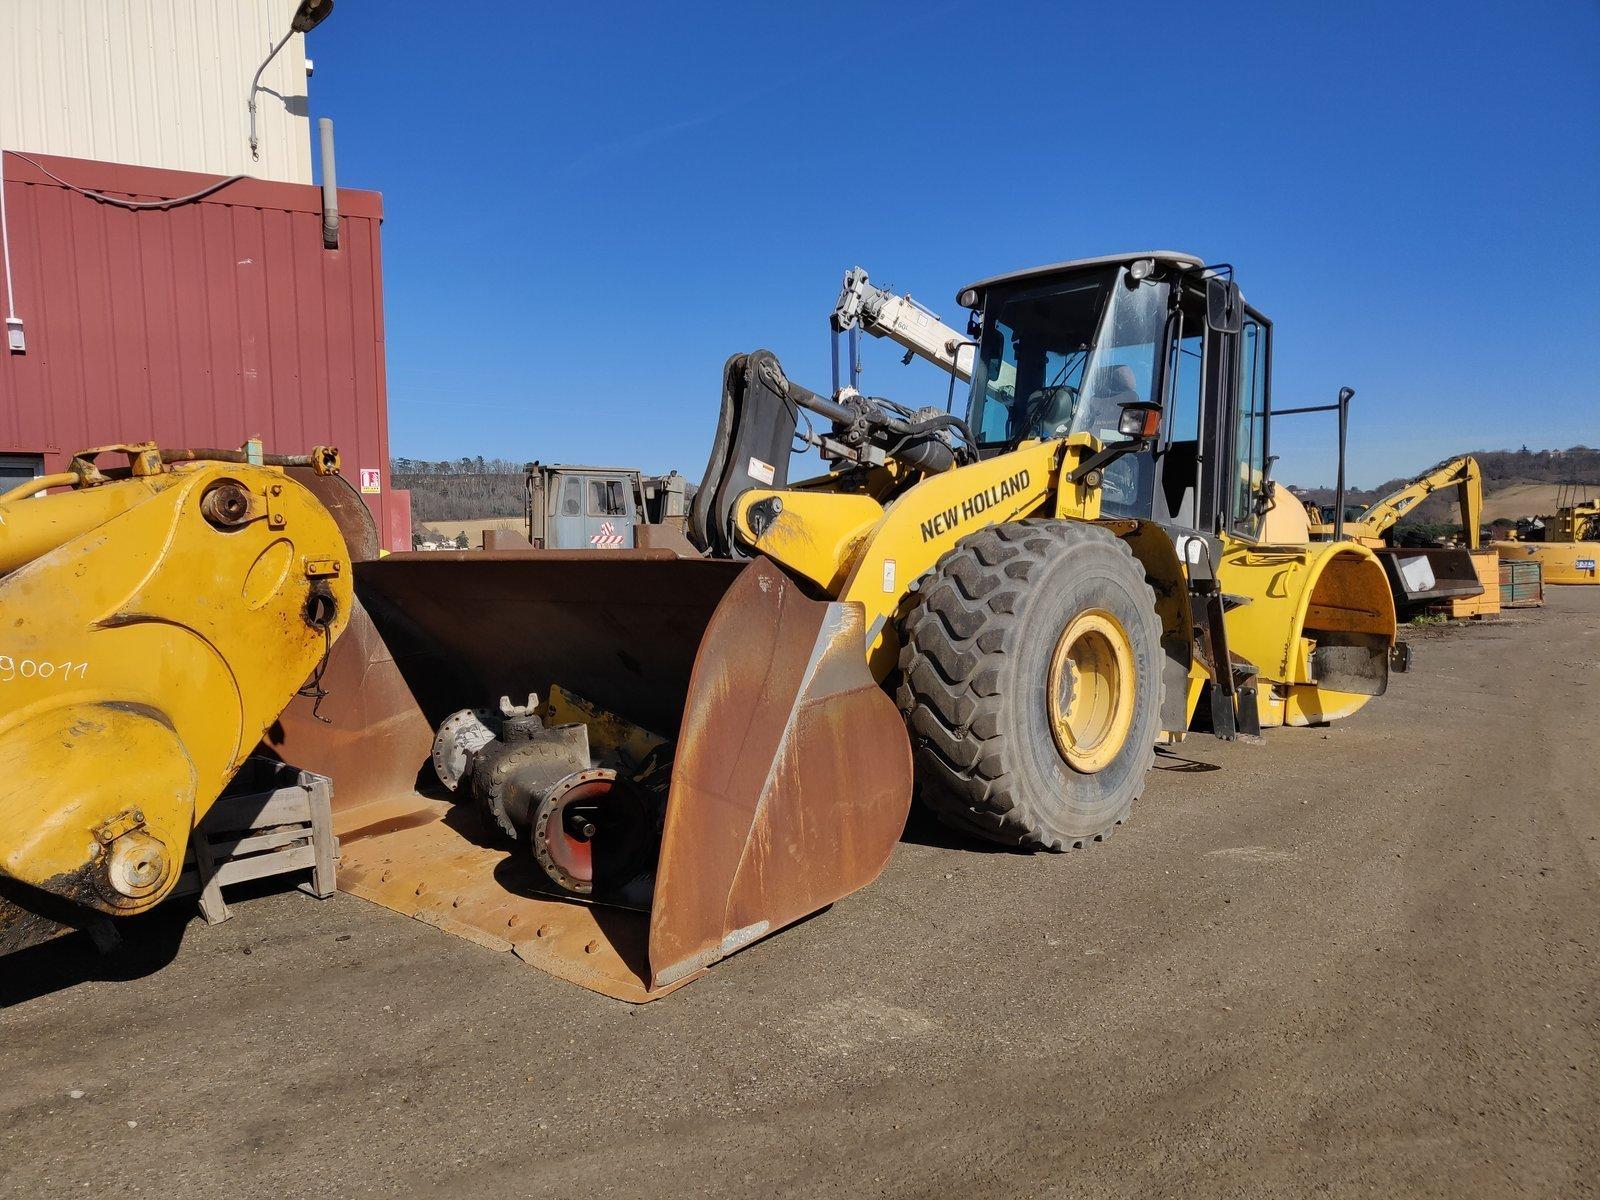 Wheel loader NEW HOLLAND W190B